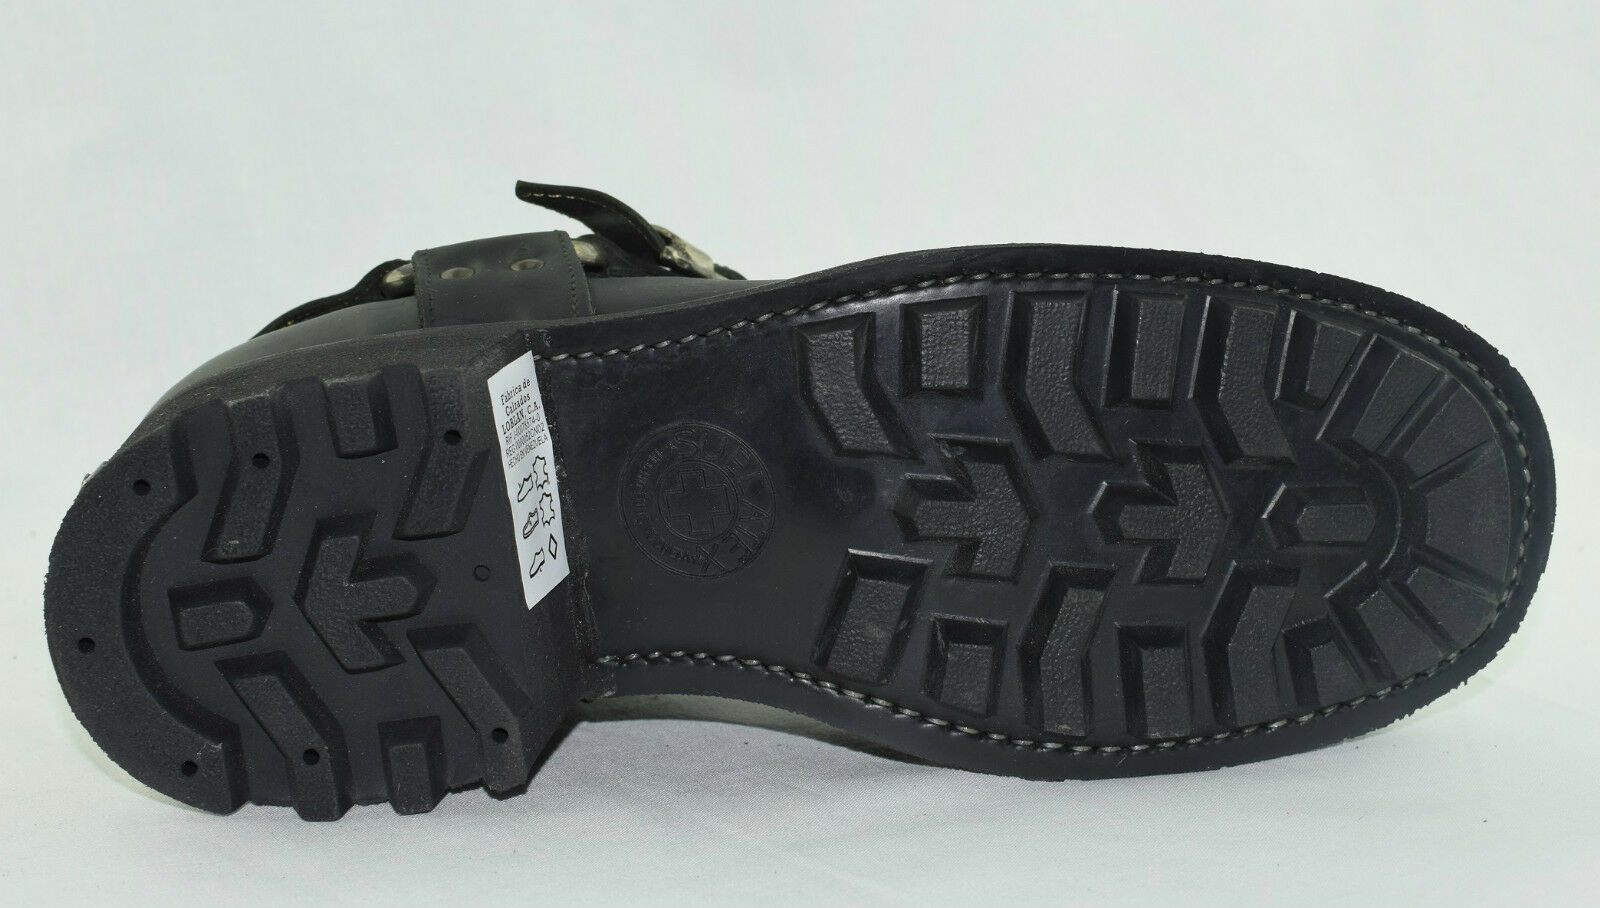 Loblan 611 Black Waxy Leather Men'S Biker Boots Classic Round Toe Handmade Bike